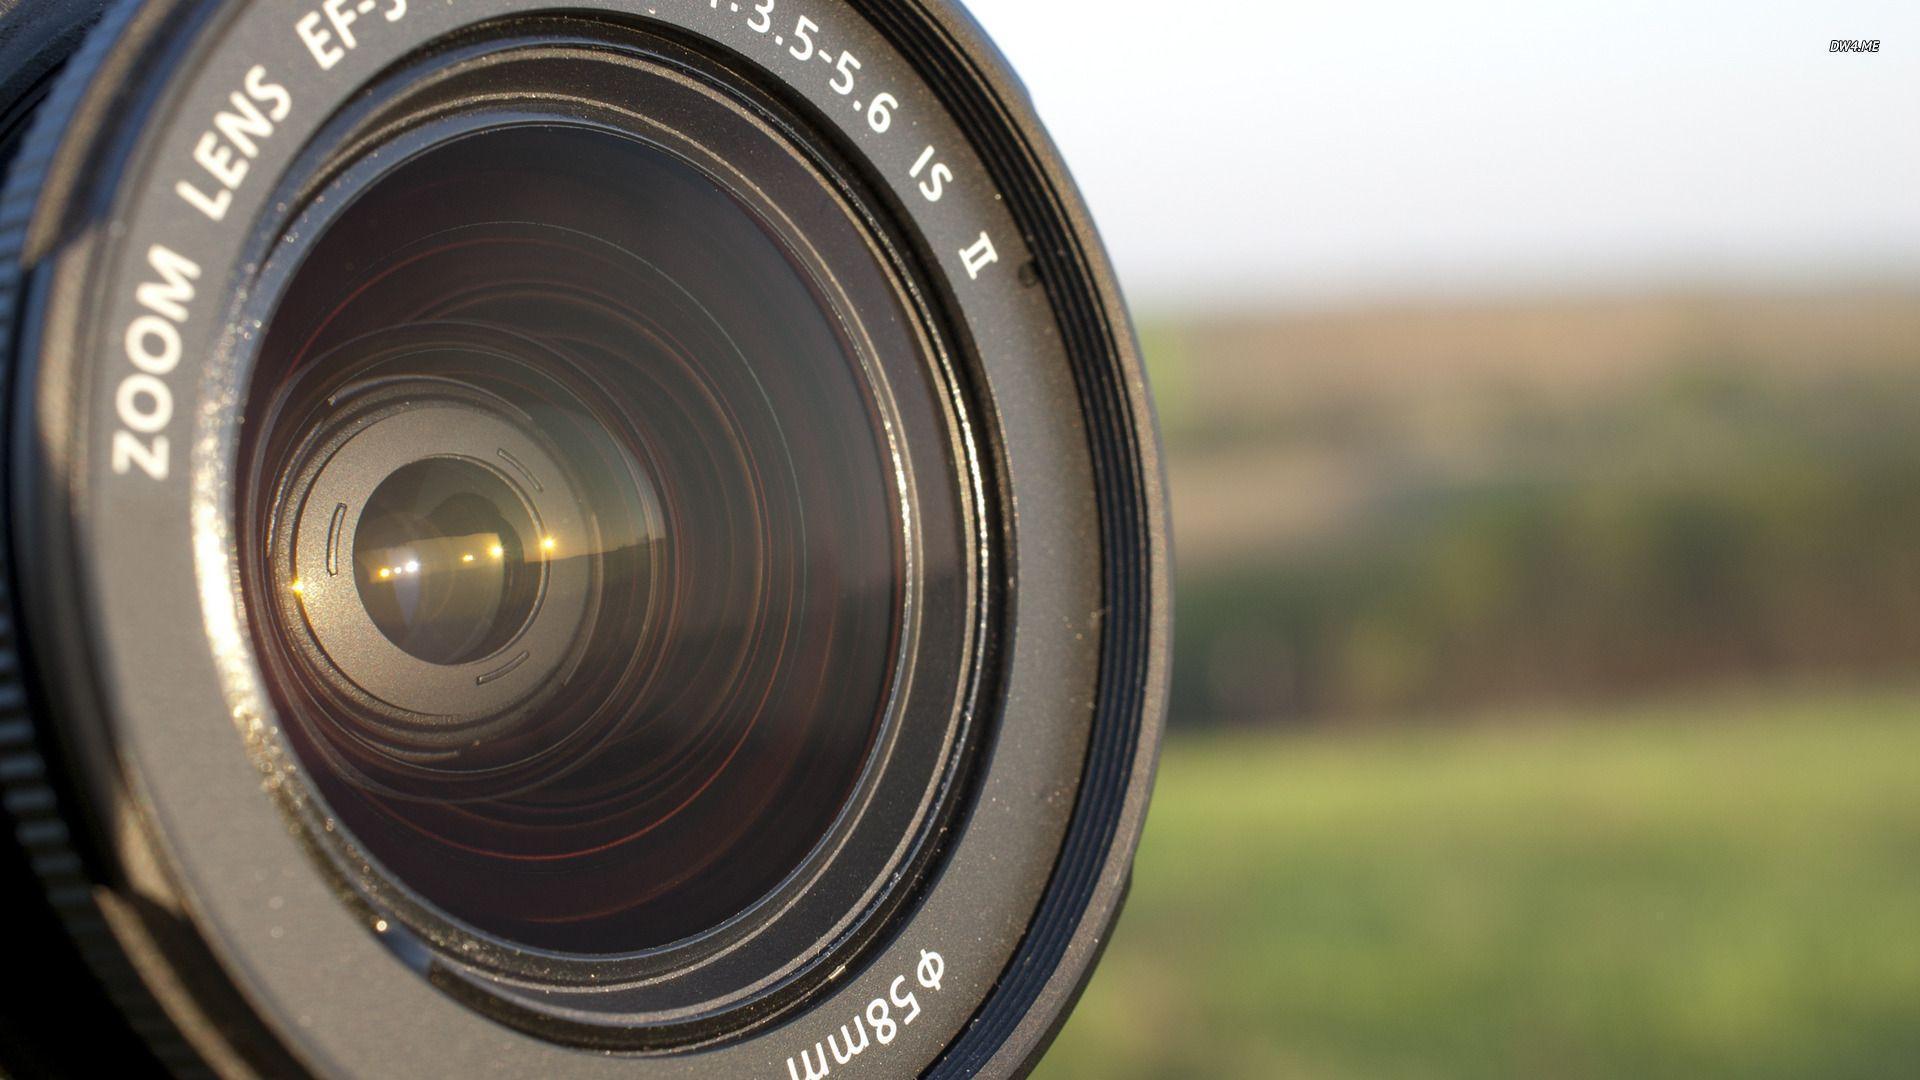 Lens Wallpaper 1920x1080 Camera 1920x1200 | LENCE | Pinterest ...